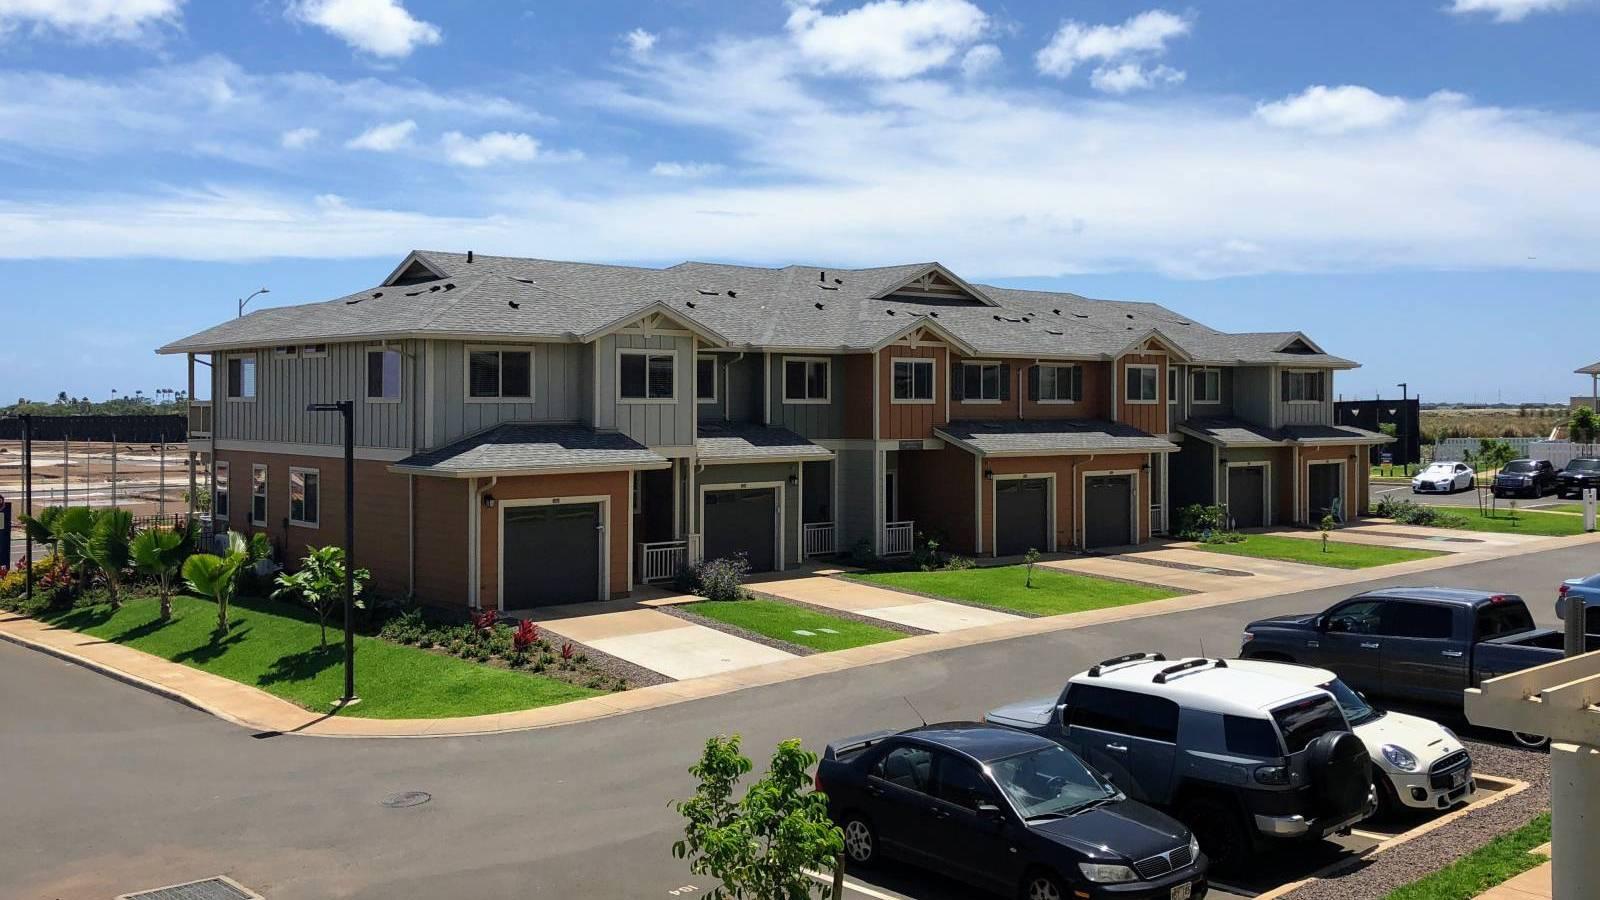 New Homes on Oahu | Ho'opili Ewa Beach - Hawaii Real ...